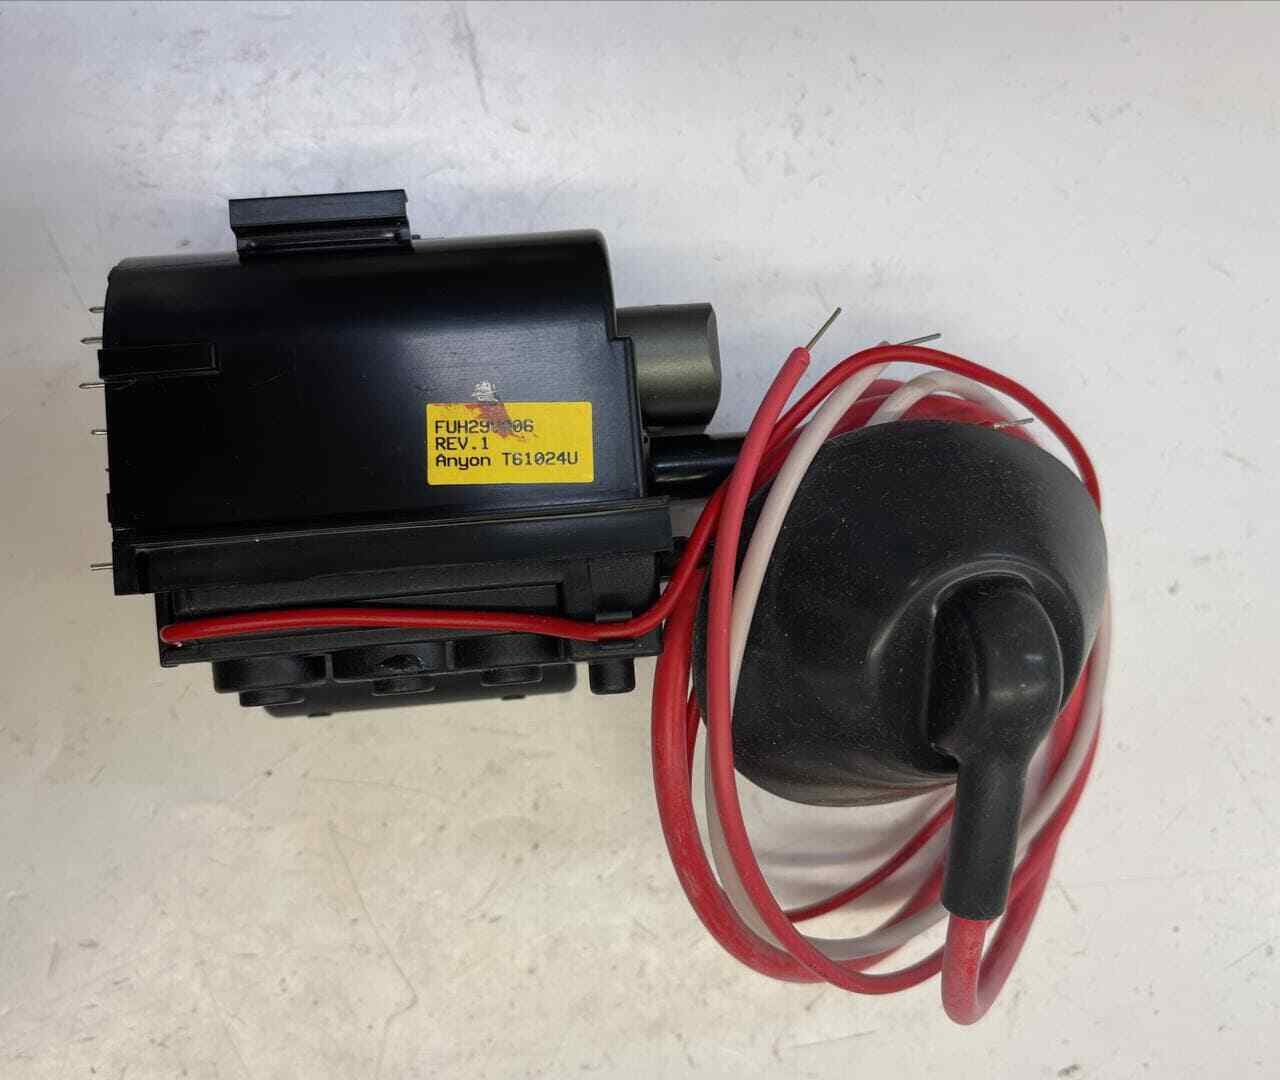 AA26-00262A FUH29V006 FLYBACK TRANSFORMER SAMSUNG TXS3082WHX TXR3080WHX/XAA - $49.00